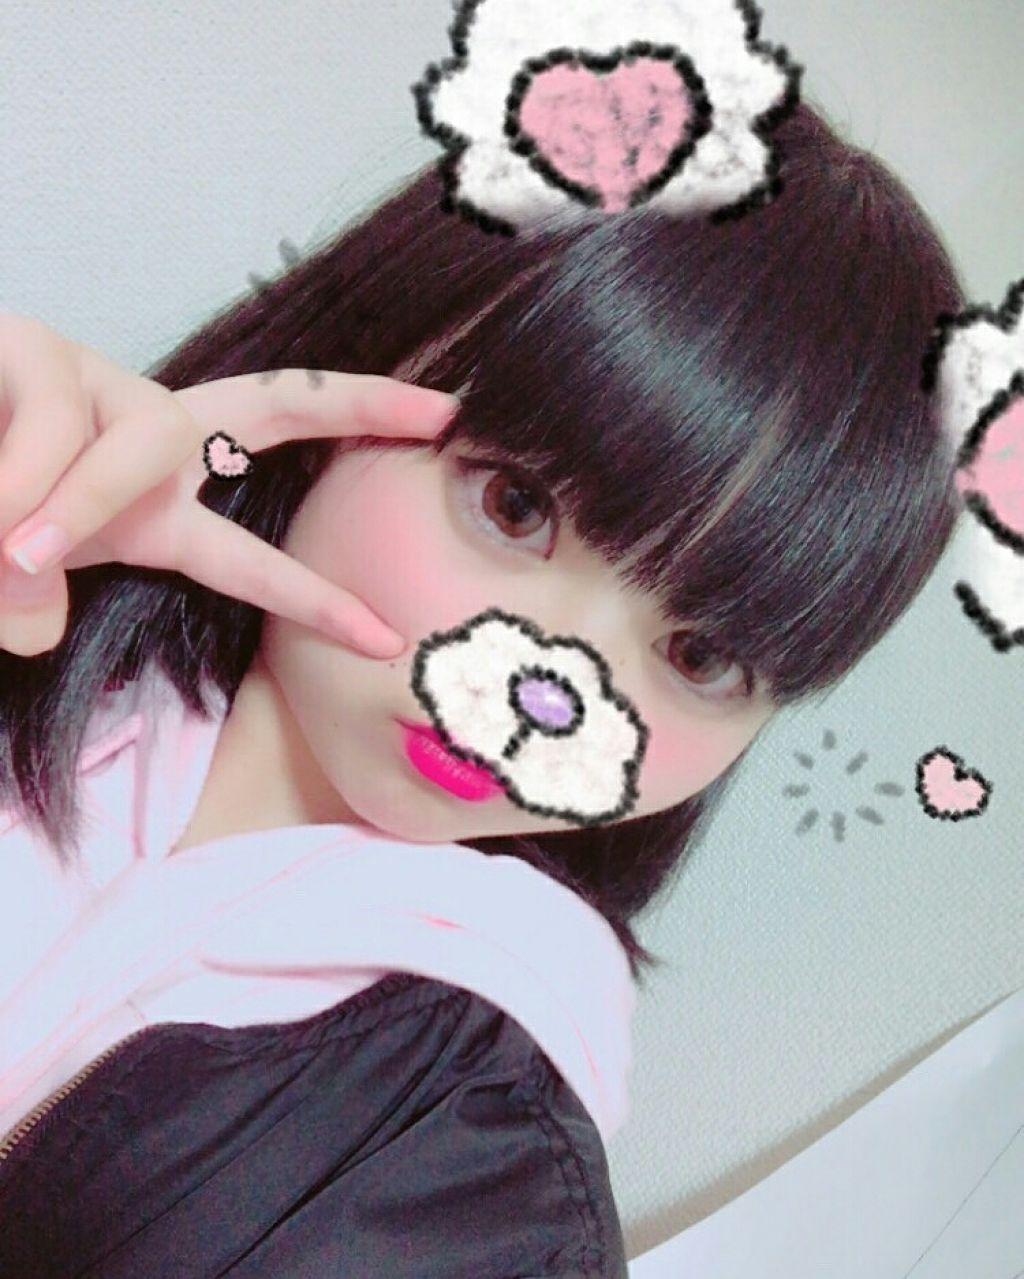 mn_kome